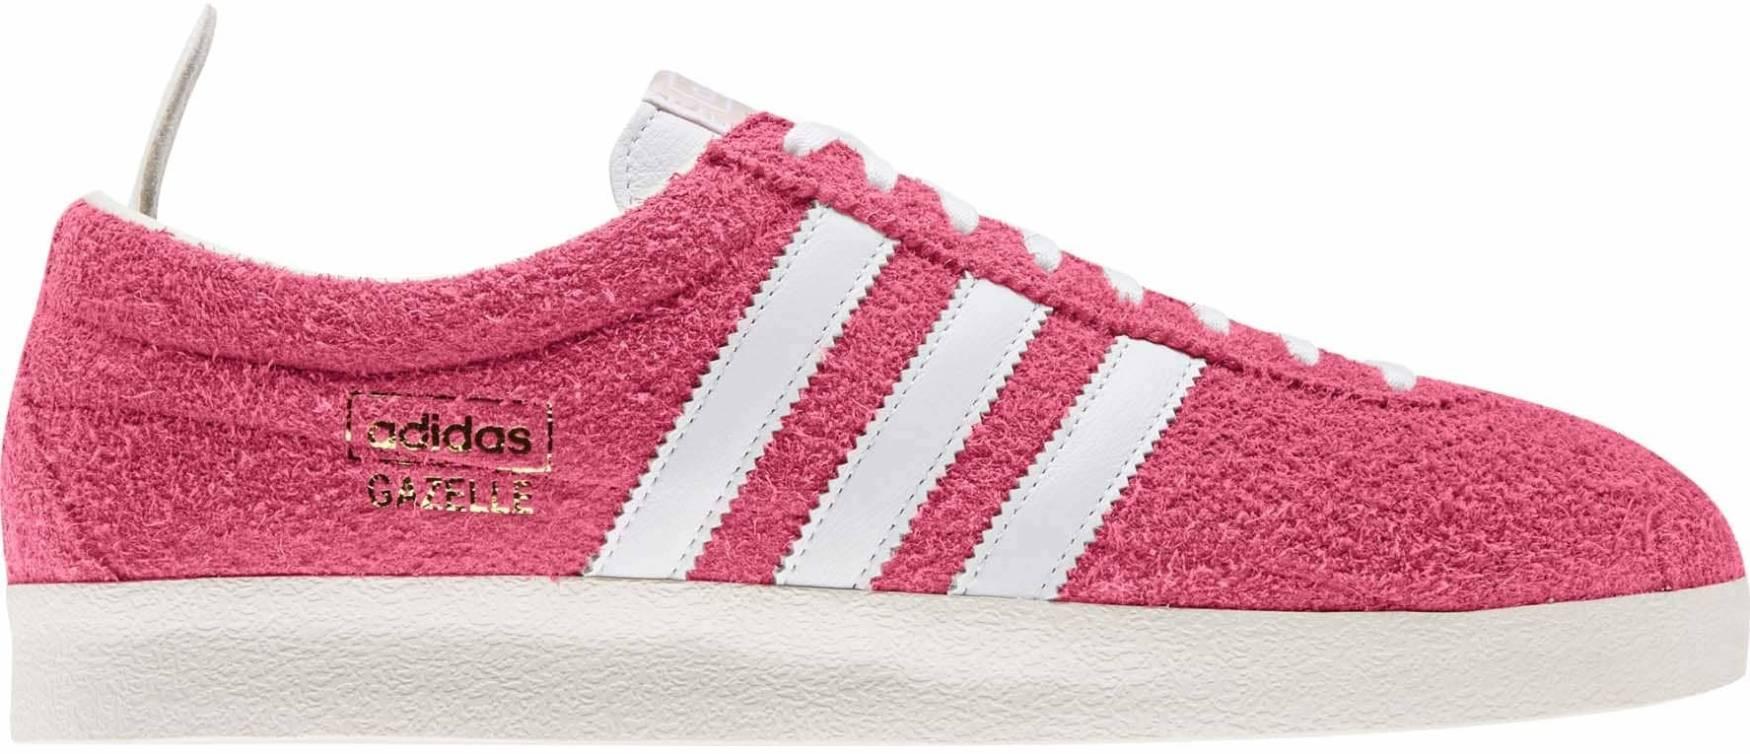 Adidas Gazelle Vintage sneakers in 5 colors (only $90) | RunRepeat